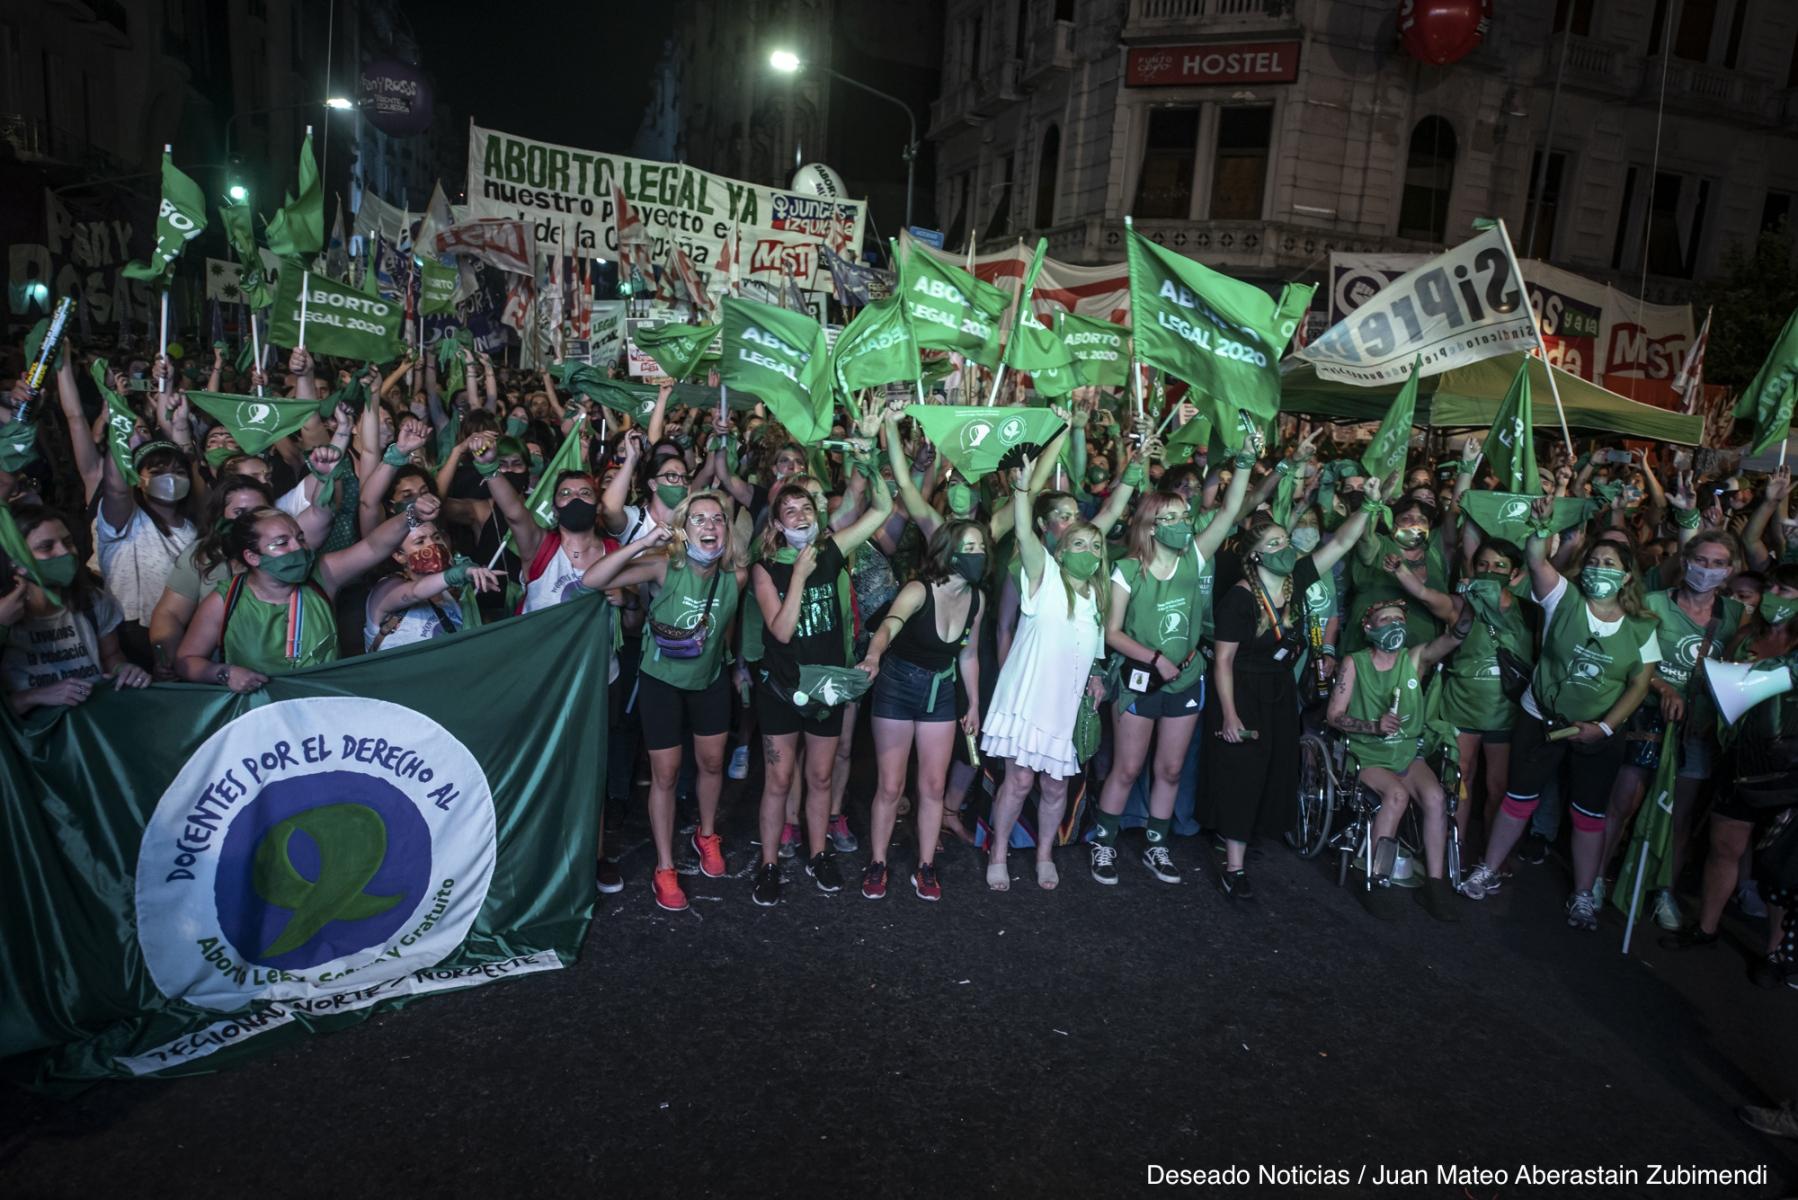 Aborto-legal_Ph_JuanMateoAberastain_6